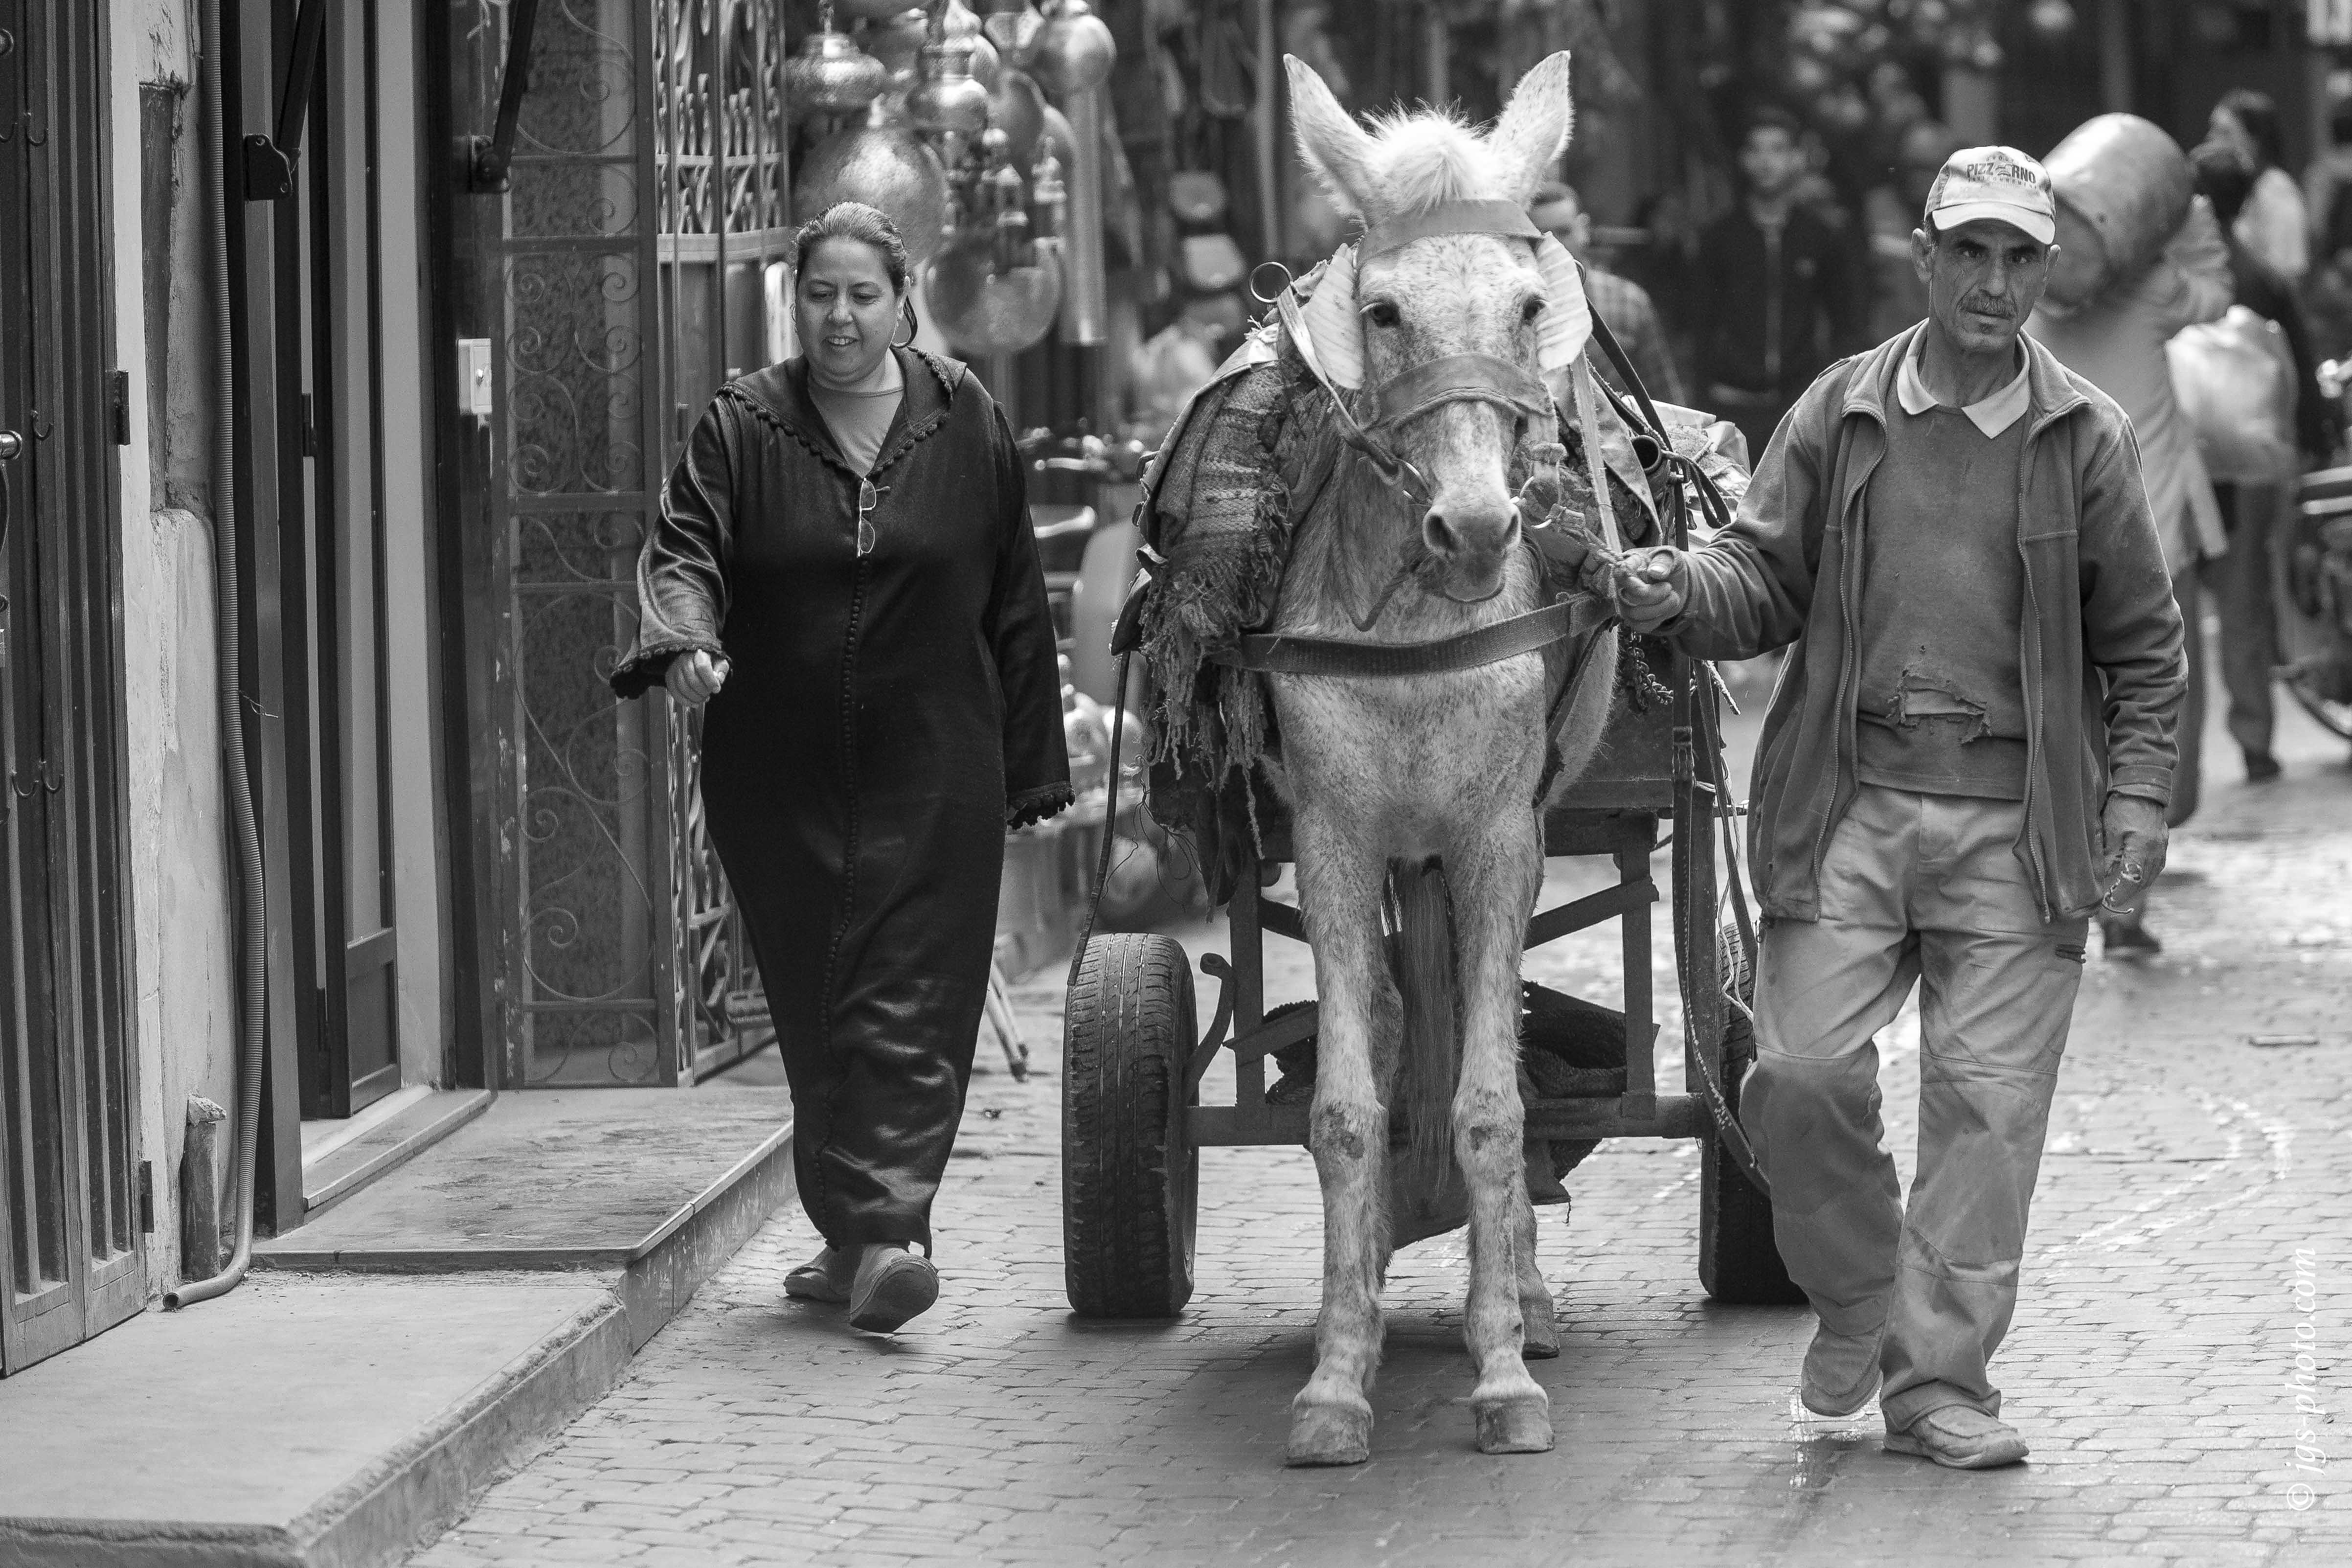 Maultiere sind in der Altstadt das flexibelste Transportmittel